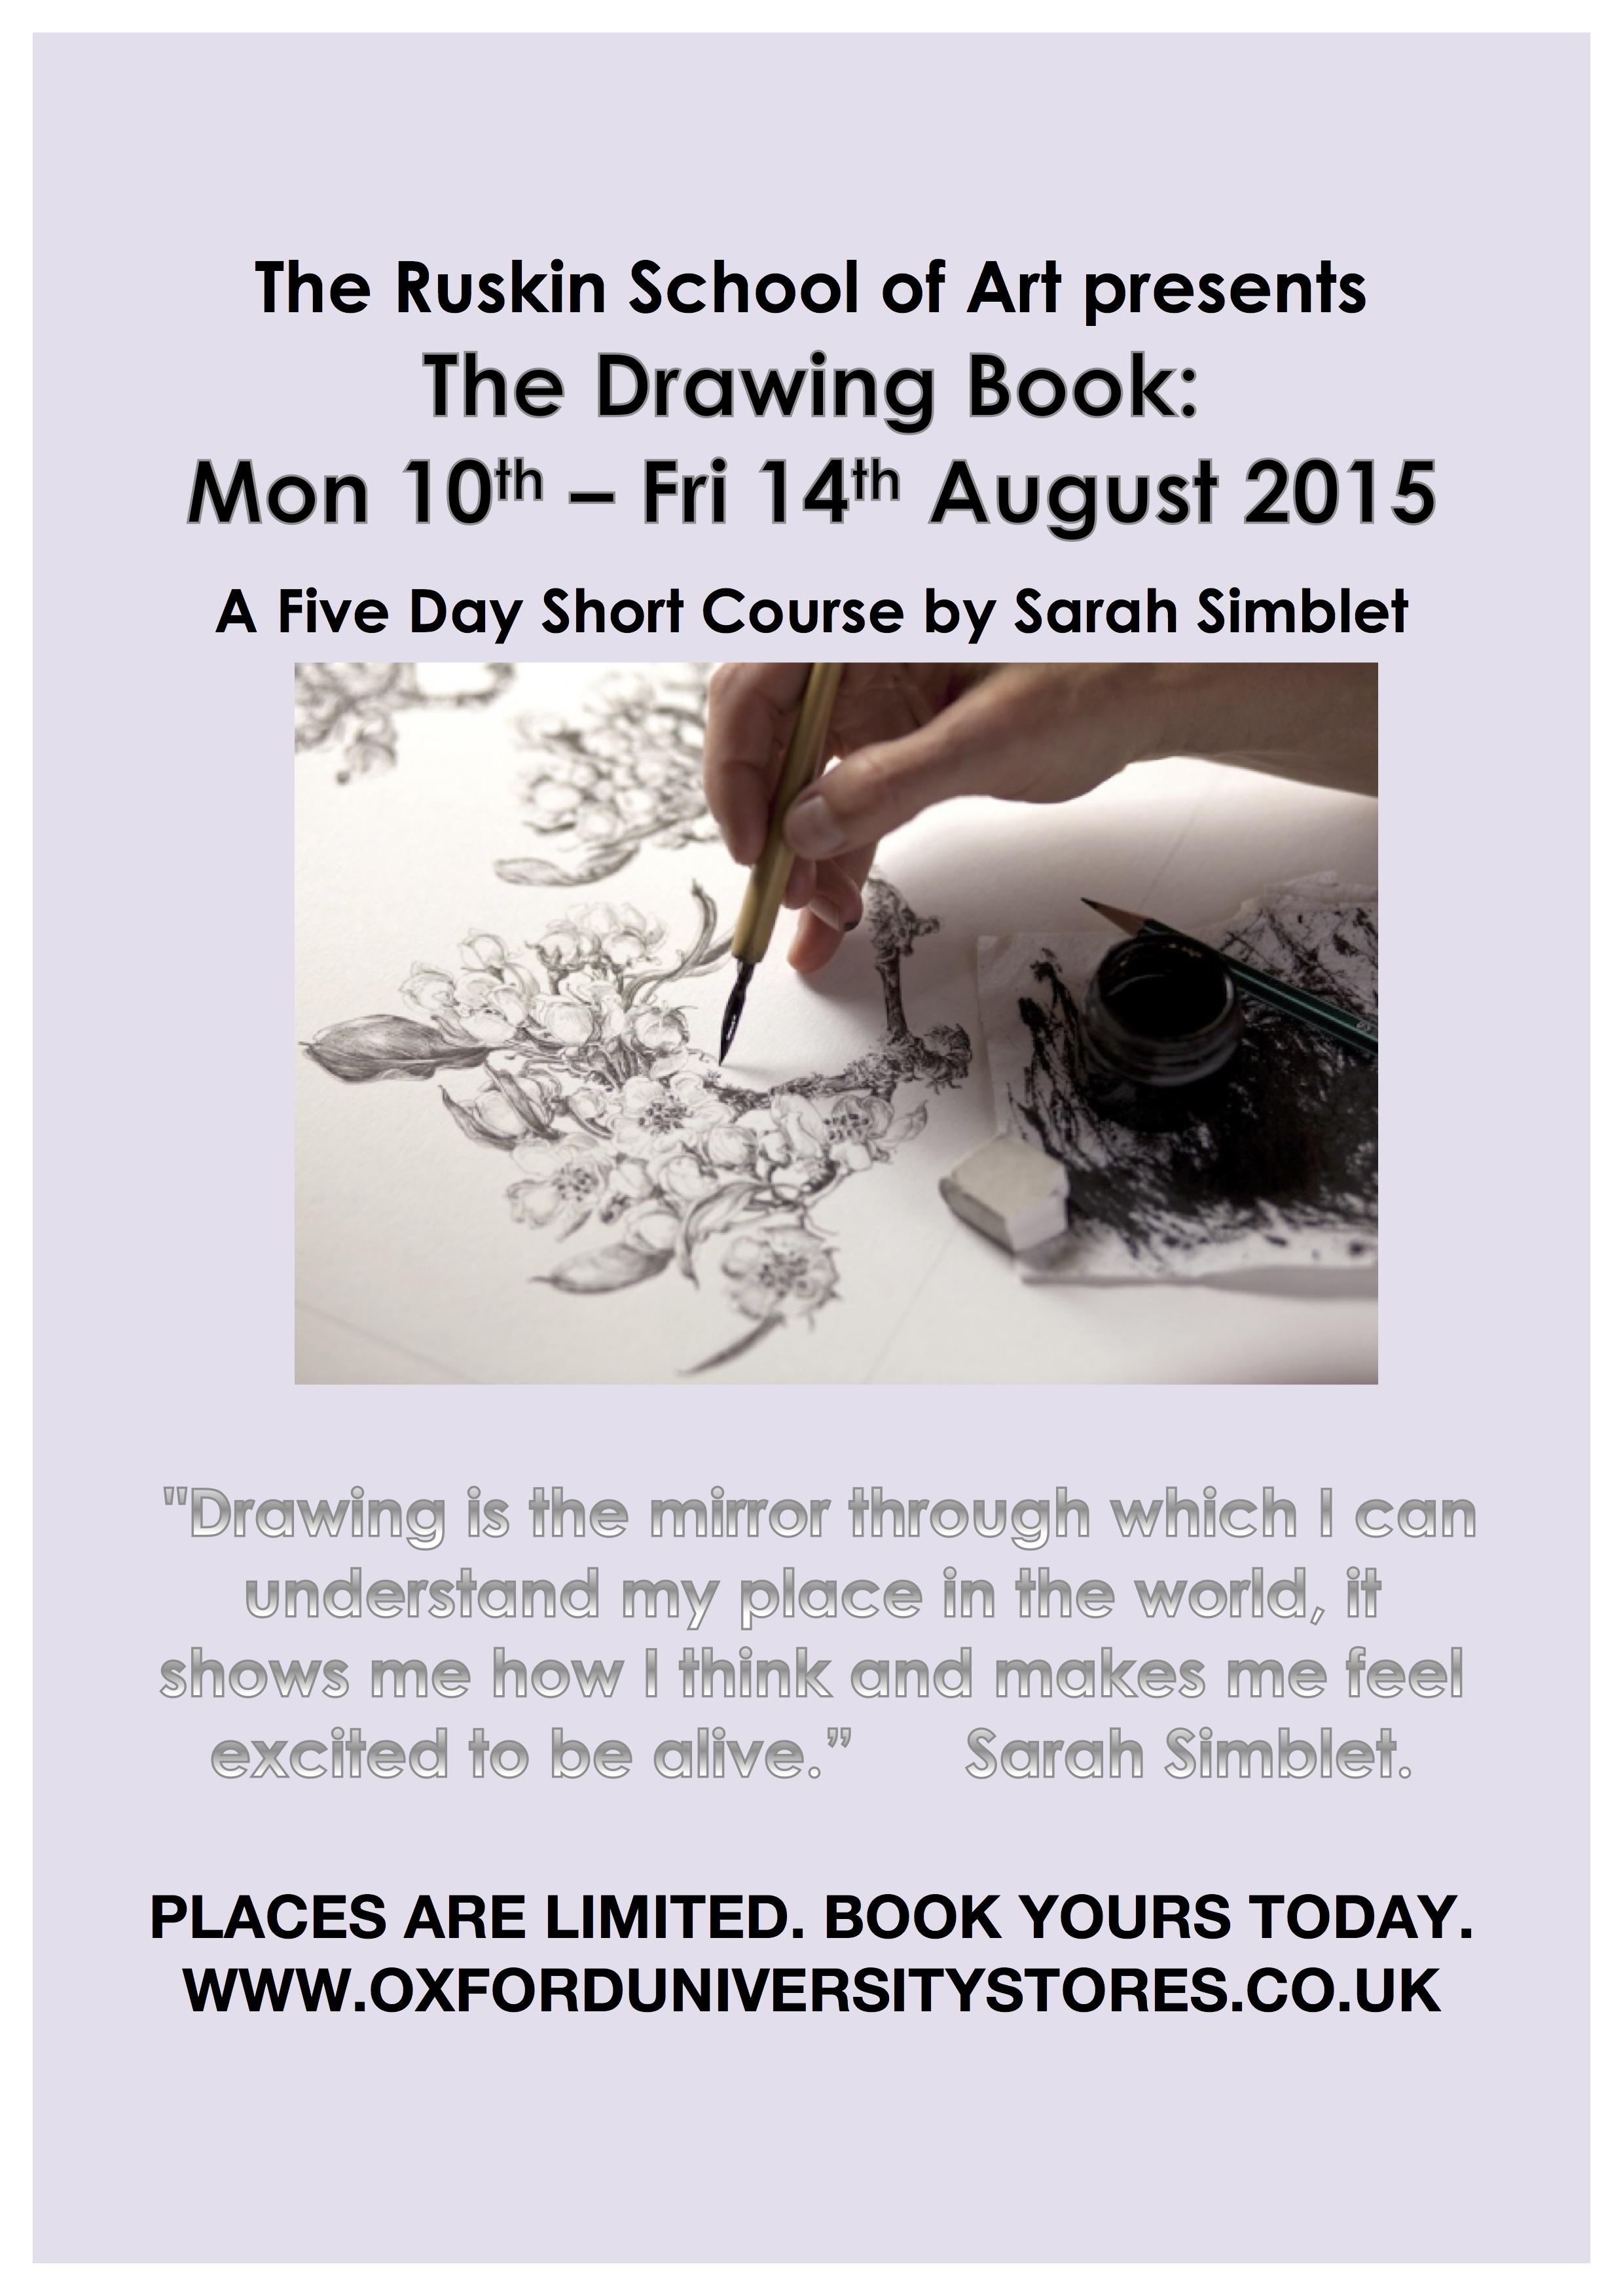 Drawing Courses with Sarah Simblet at Ruskin School of Art | ArtPlantae